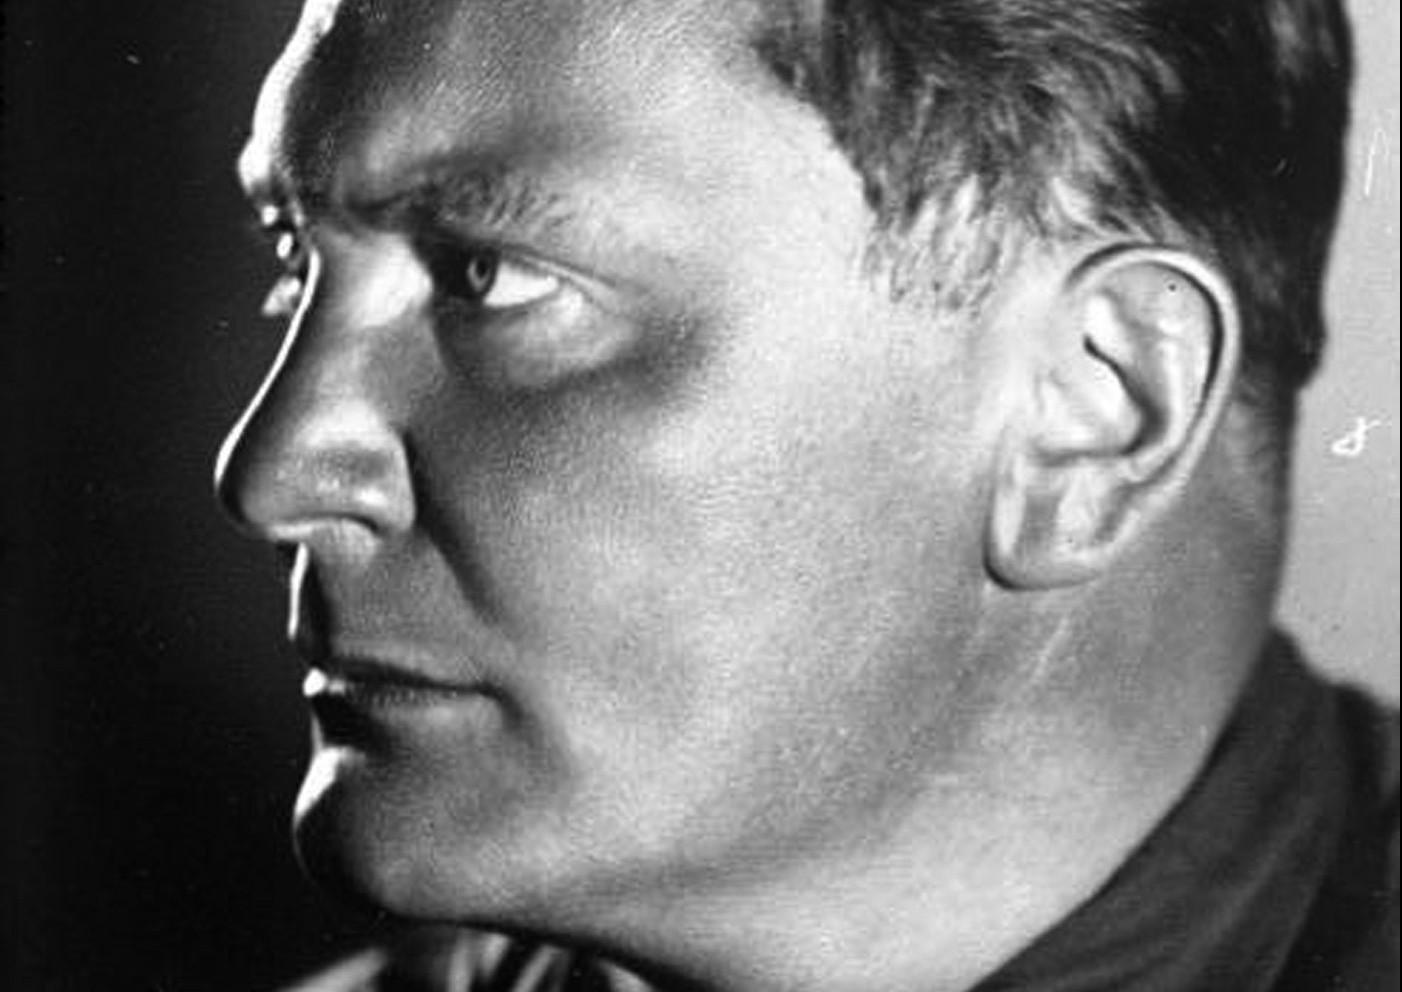 Dochter Hermann Göring wil erfenis terug